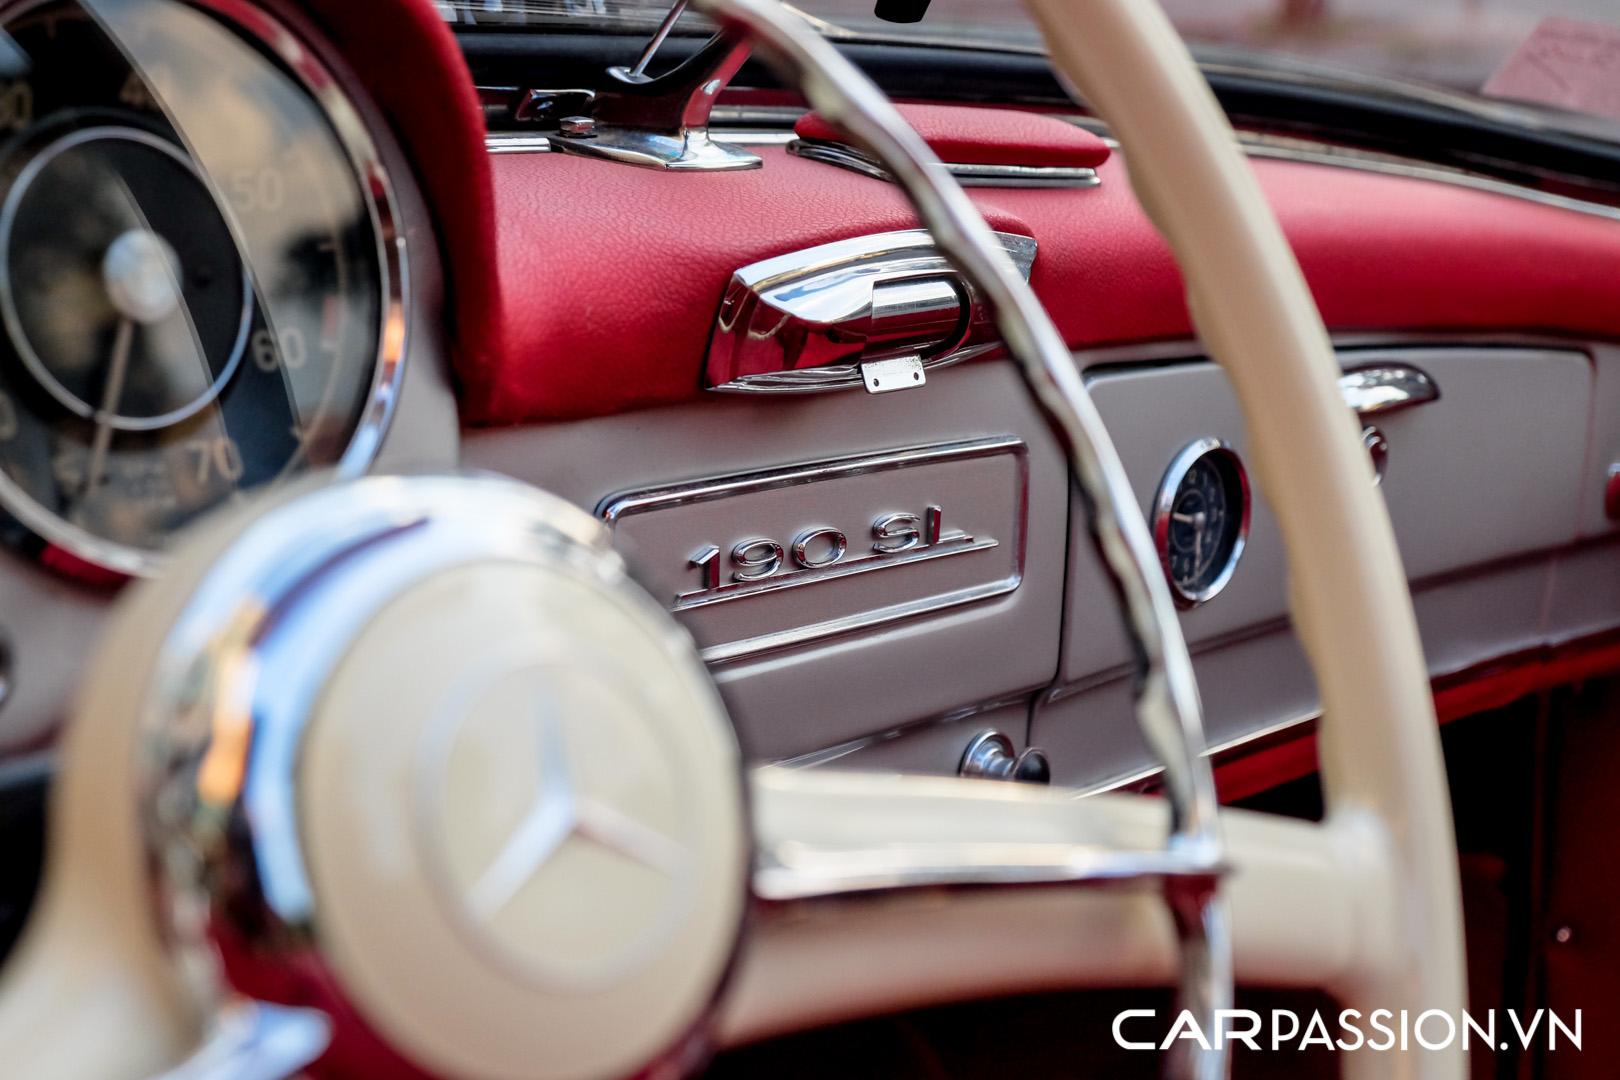 CP-Mercedes-Benz 190SL (64).jpg